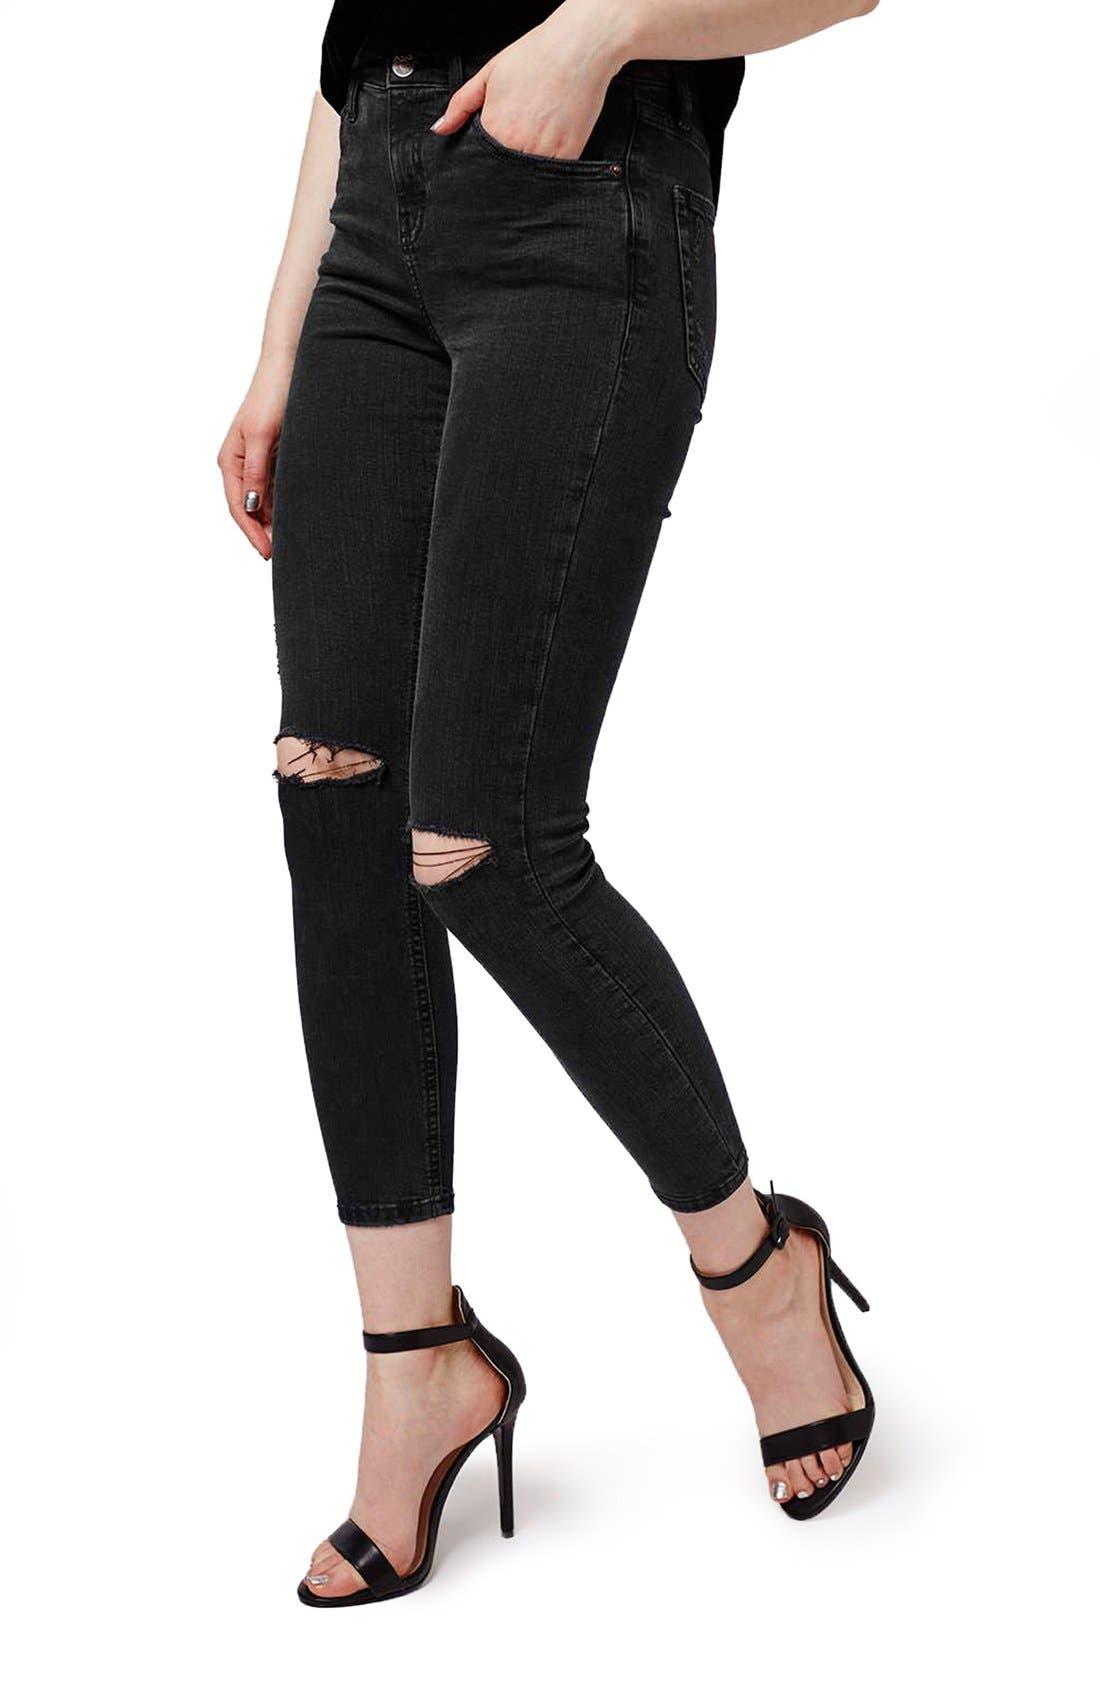 Alternate Image 1 Selected - Topshop Moto 'Jamie' Ripped Skinny Crop Jeans (Petite)